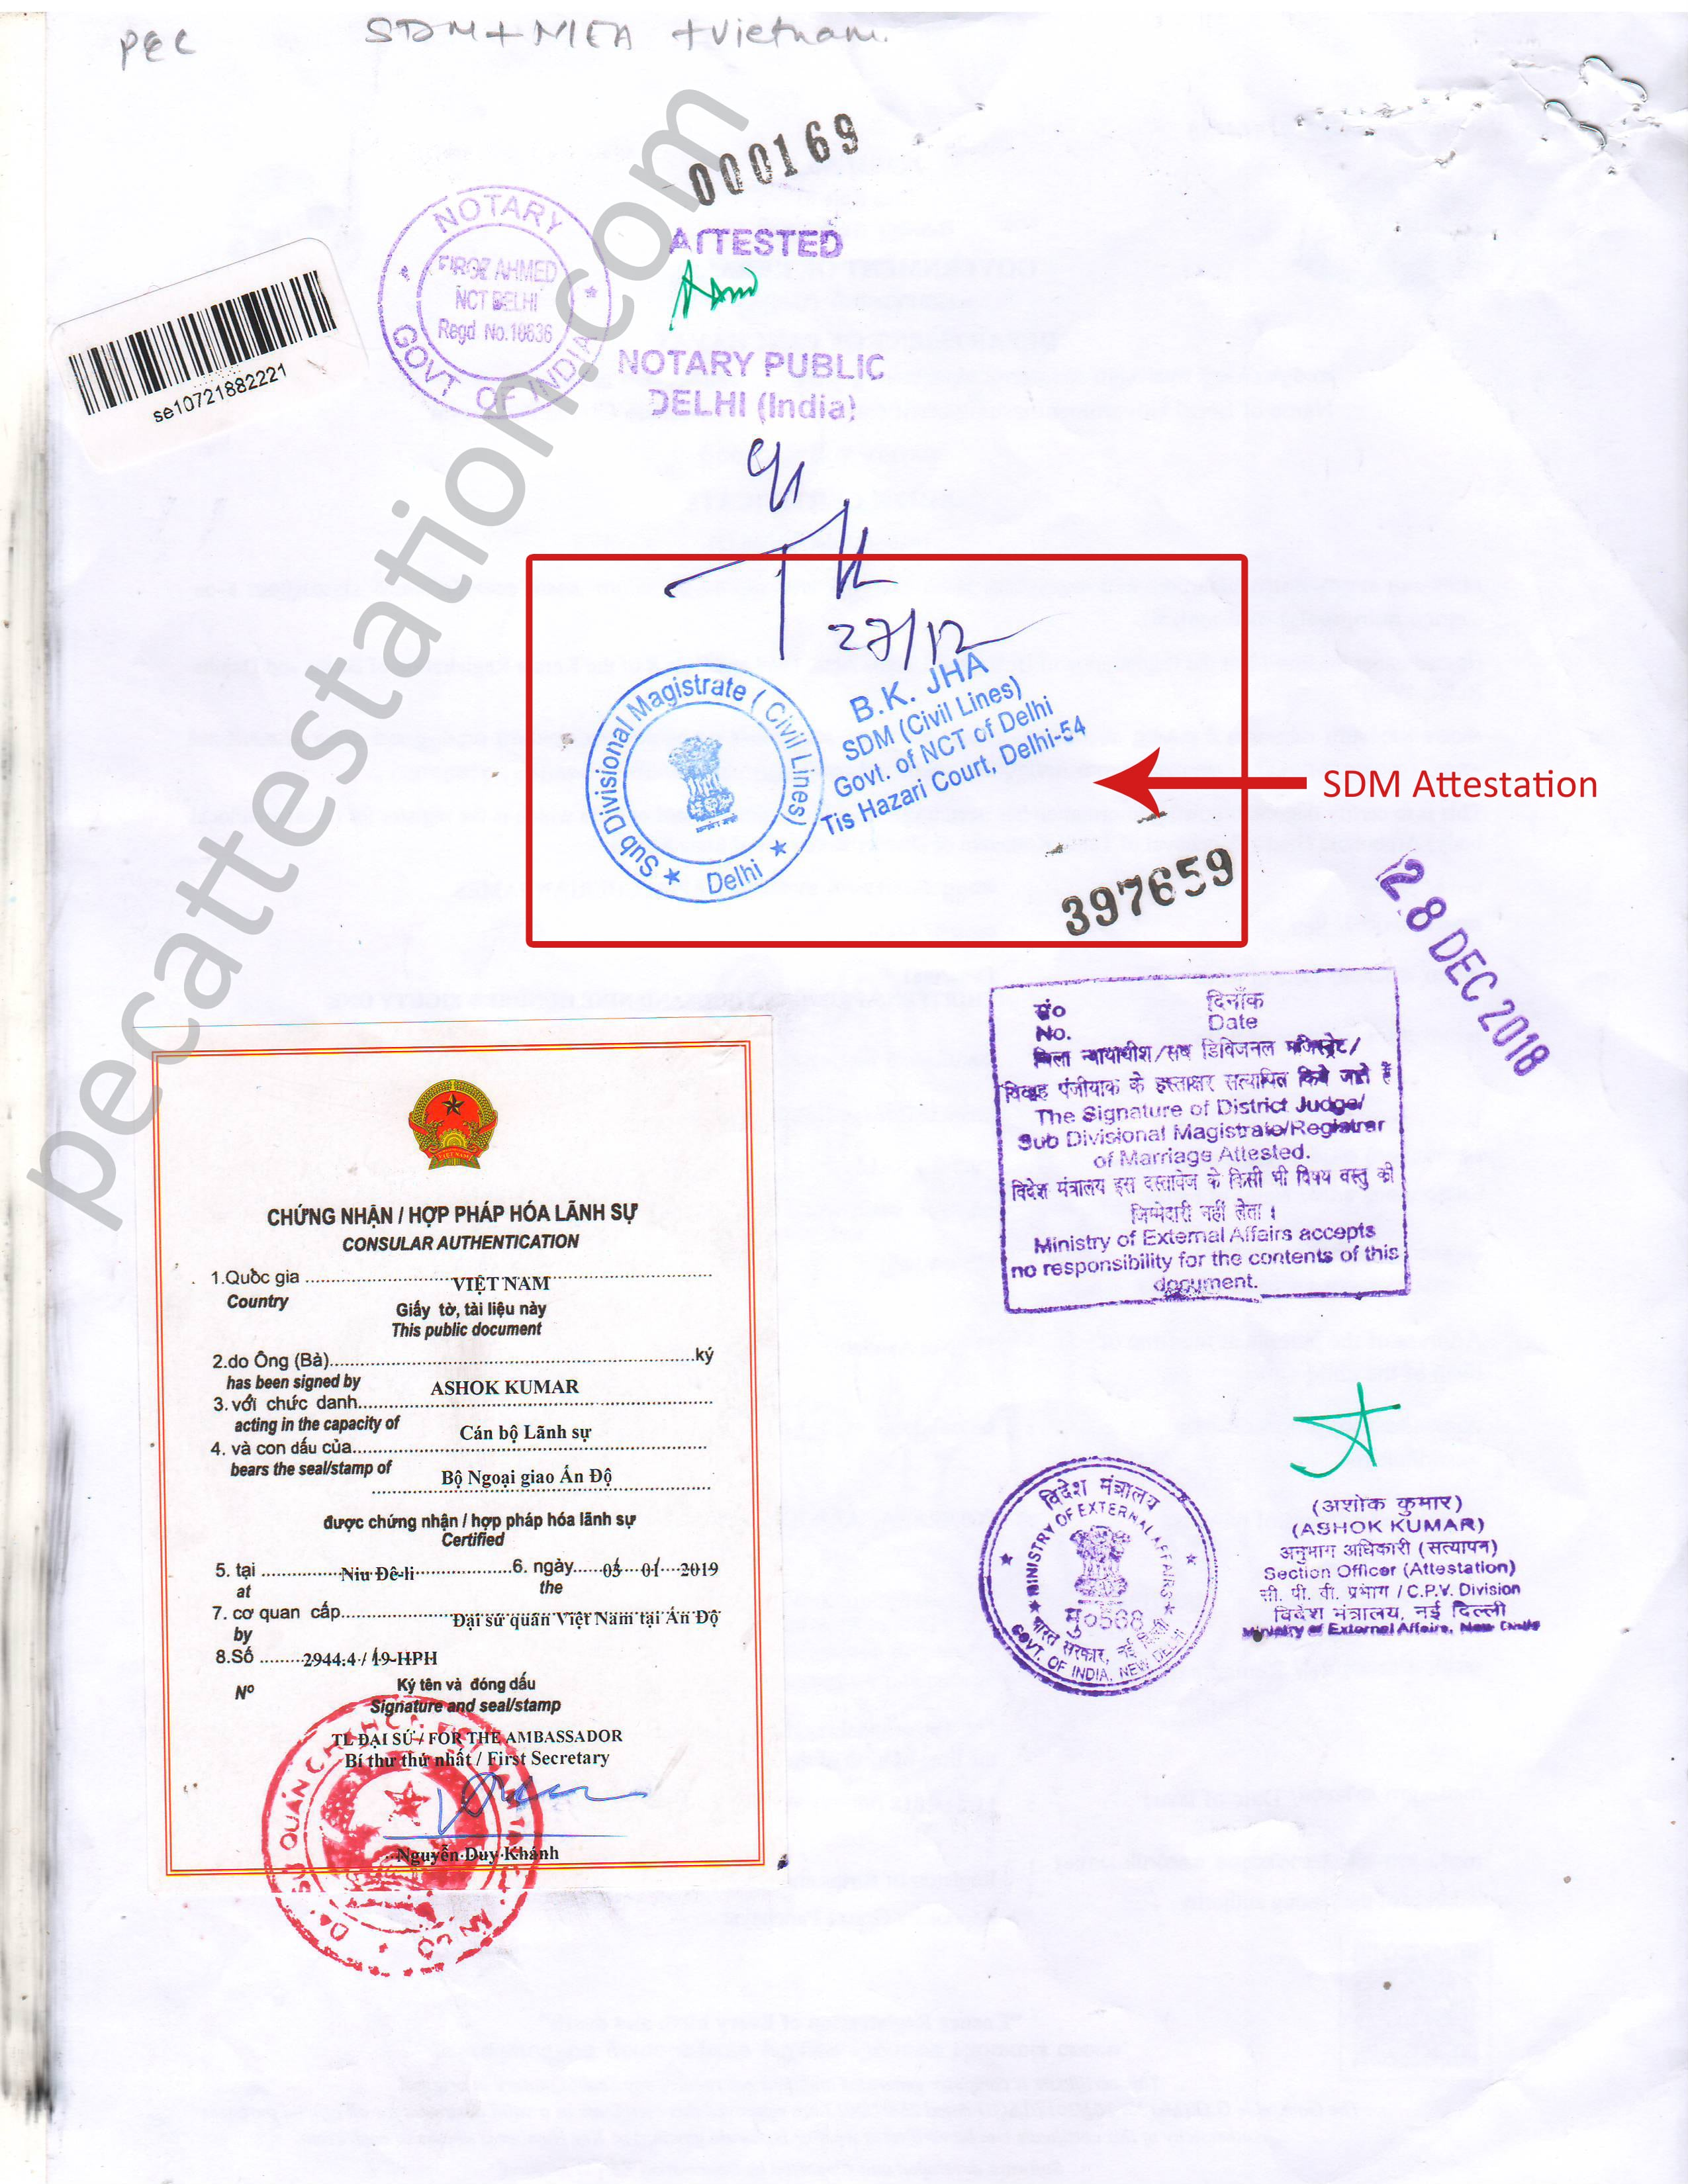 SDM Attestation for Birth Certificate